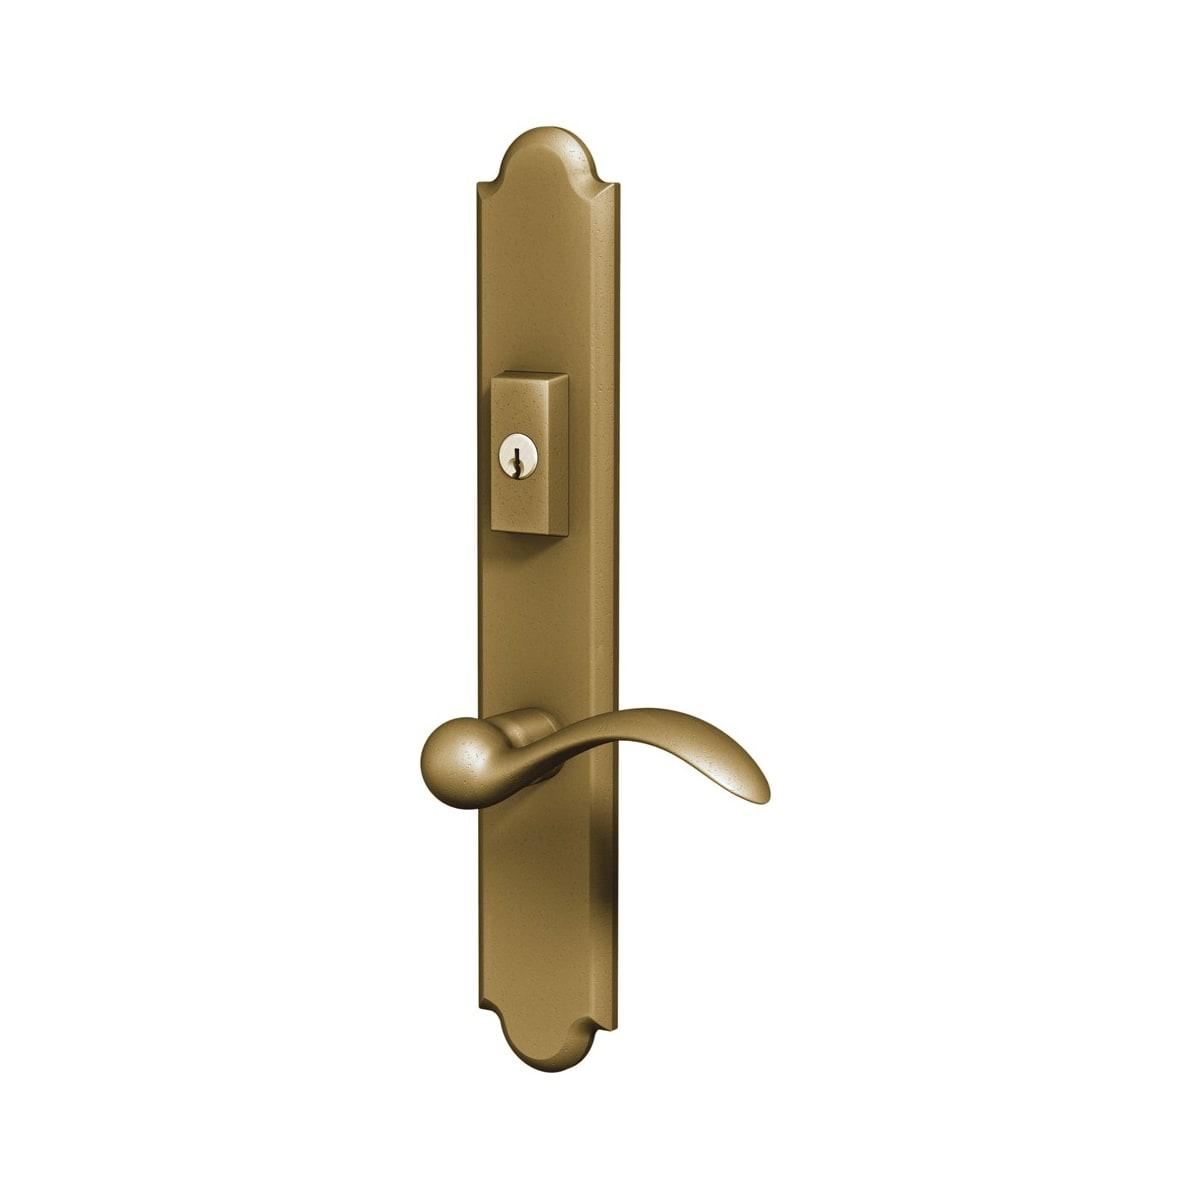 Baldwin Boulder Door Configuration 2 Patio Multi Point Trim Lever Set with American Cylinder Above Handle